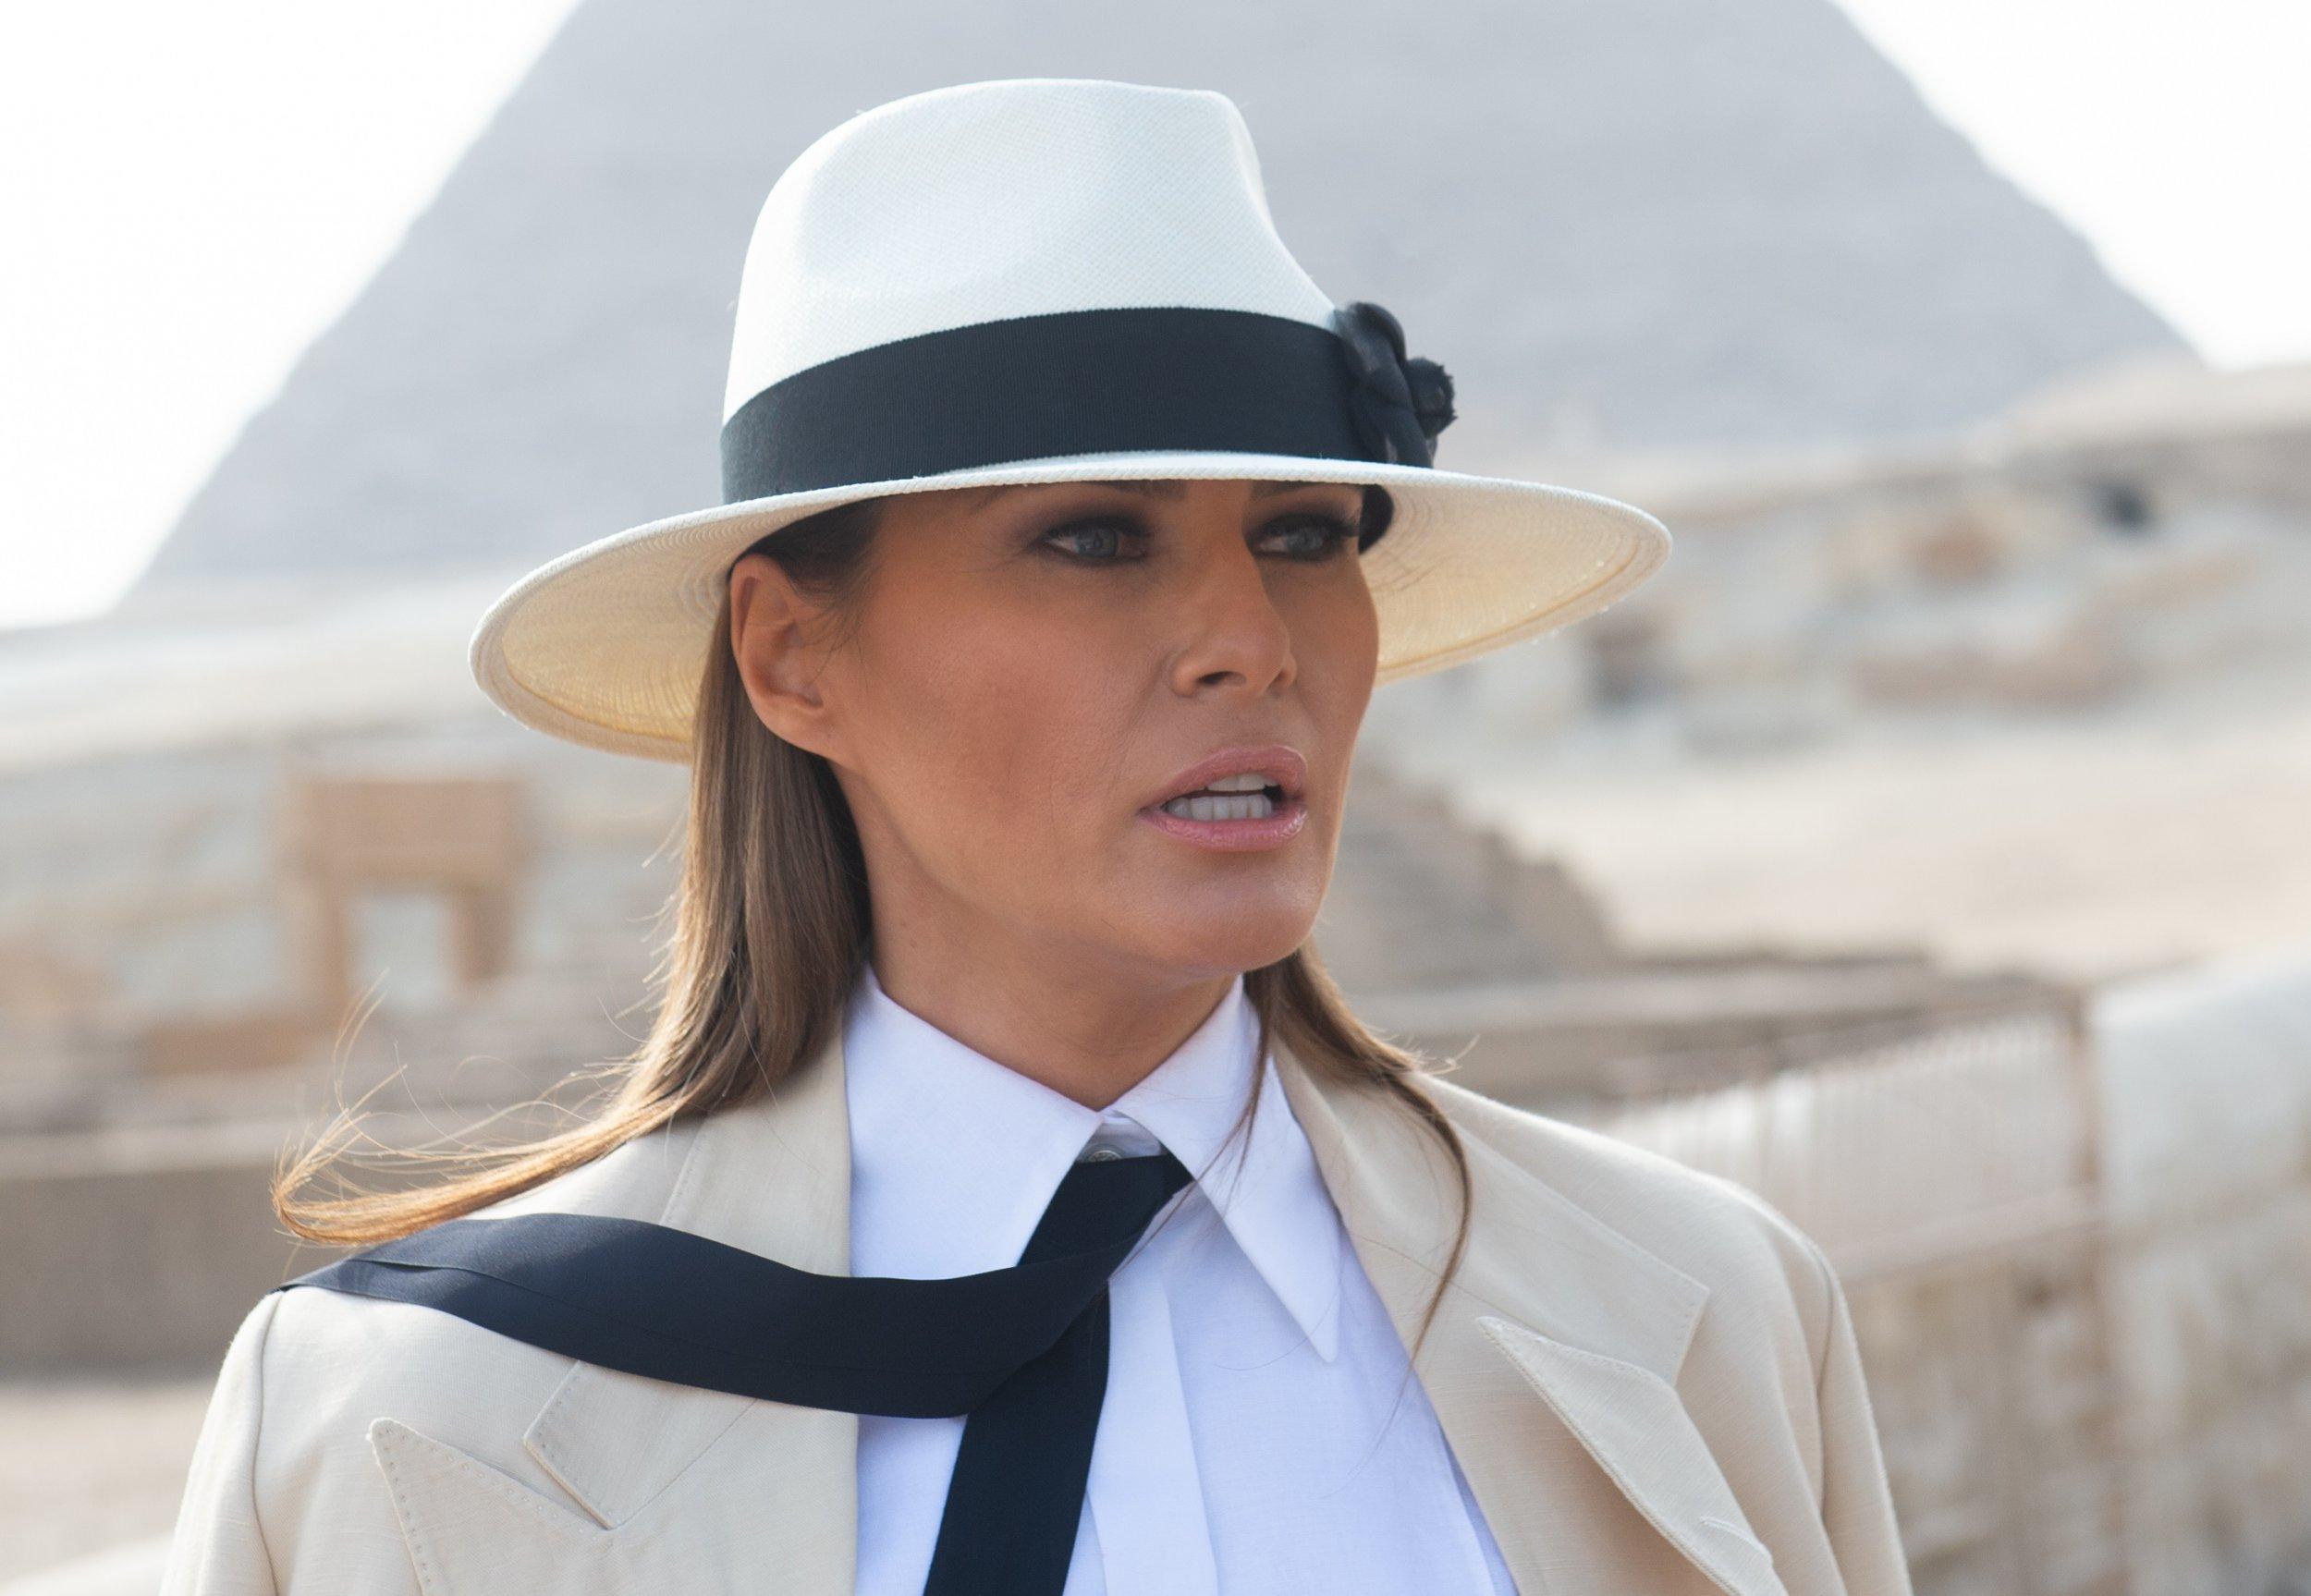 Melania Trump Spokesperson Calls For Boycott Of Rapper